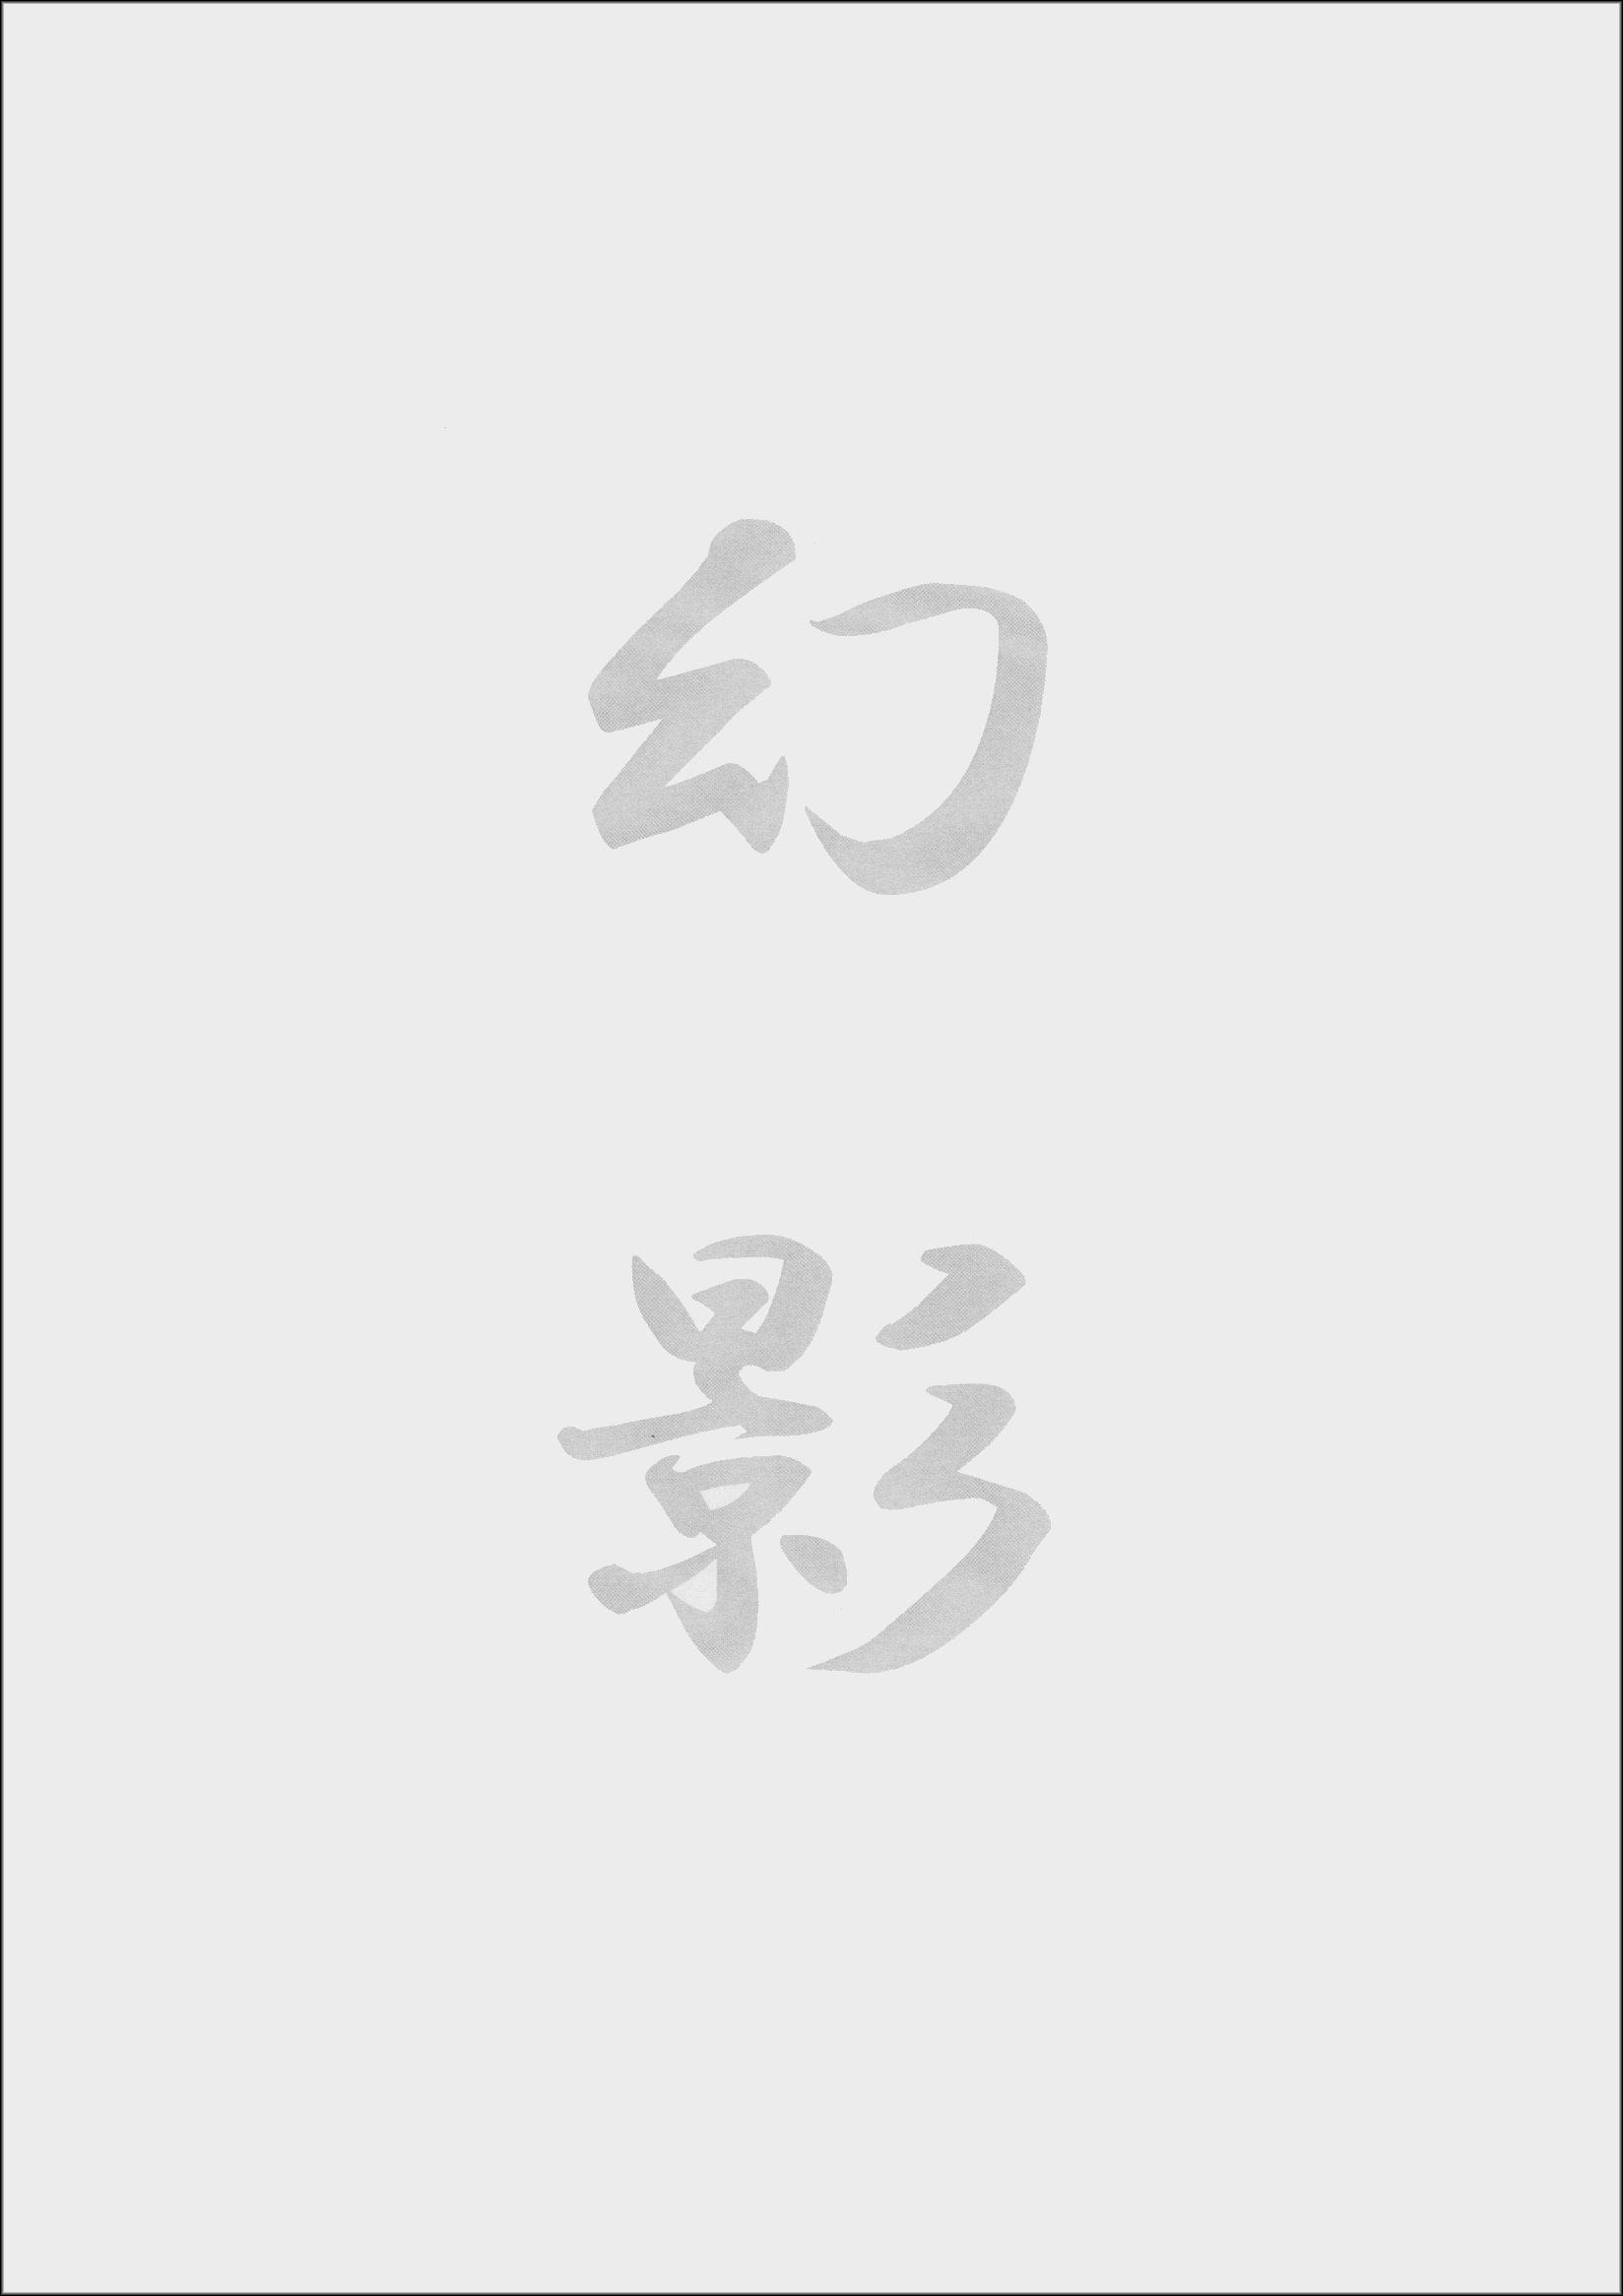 C11281763